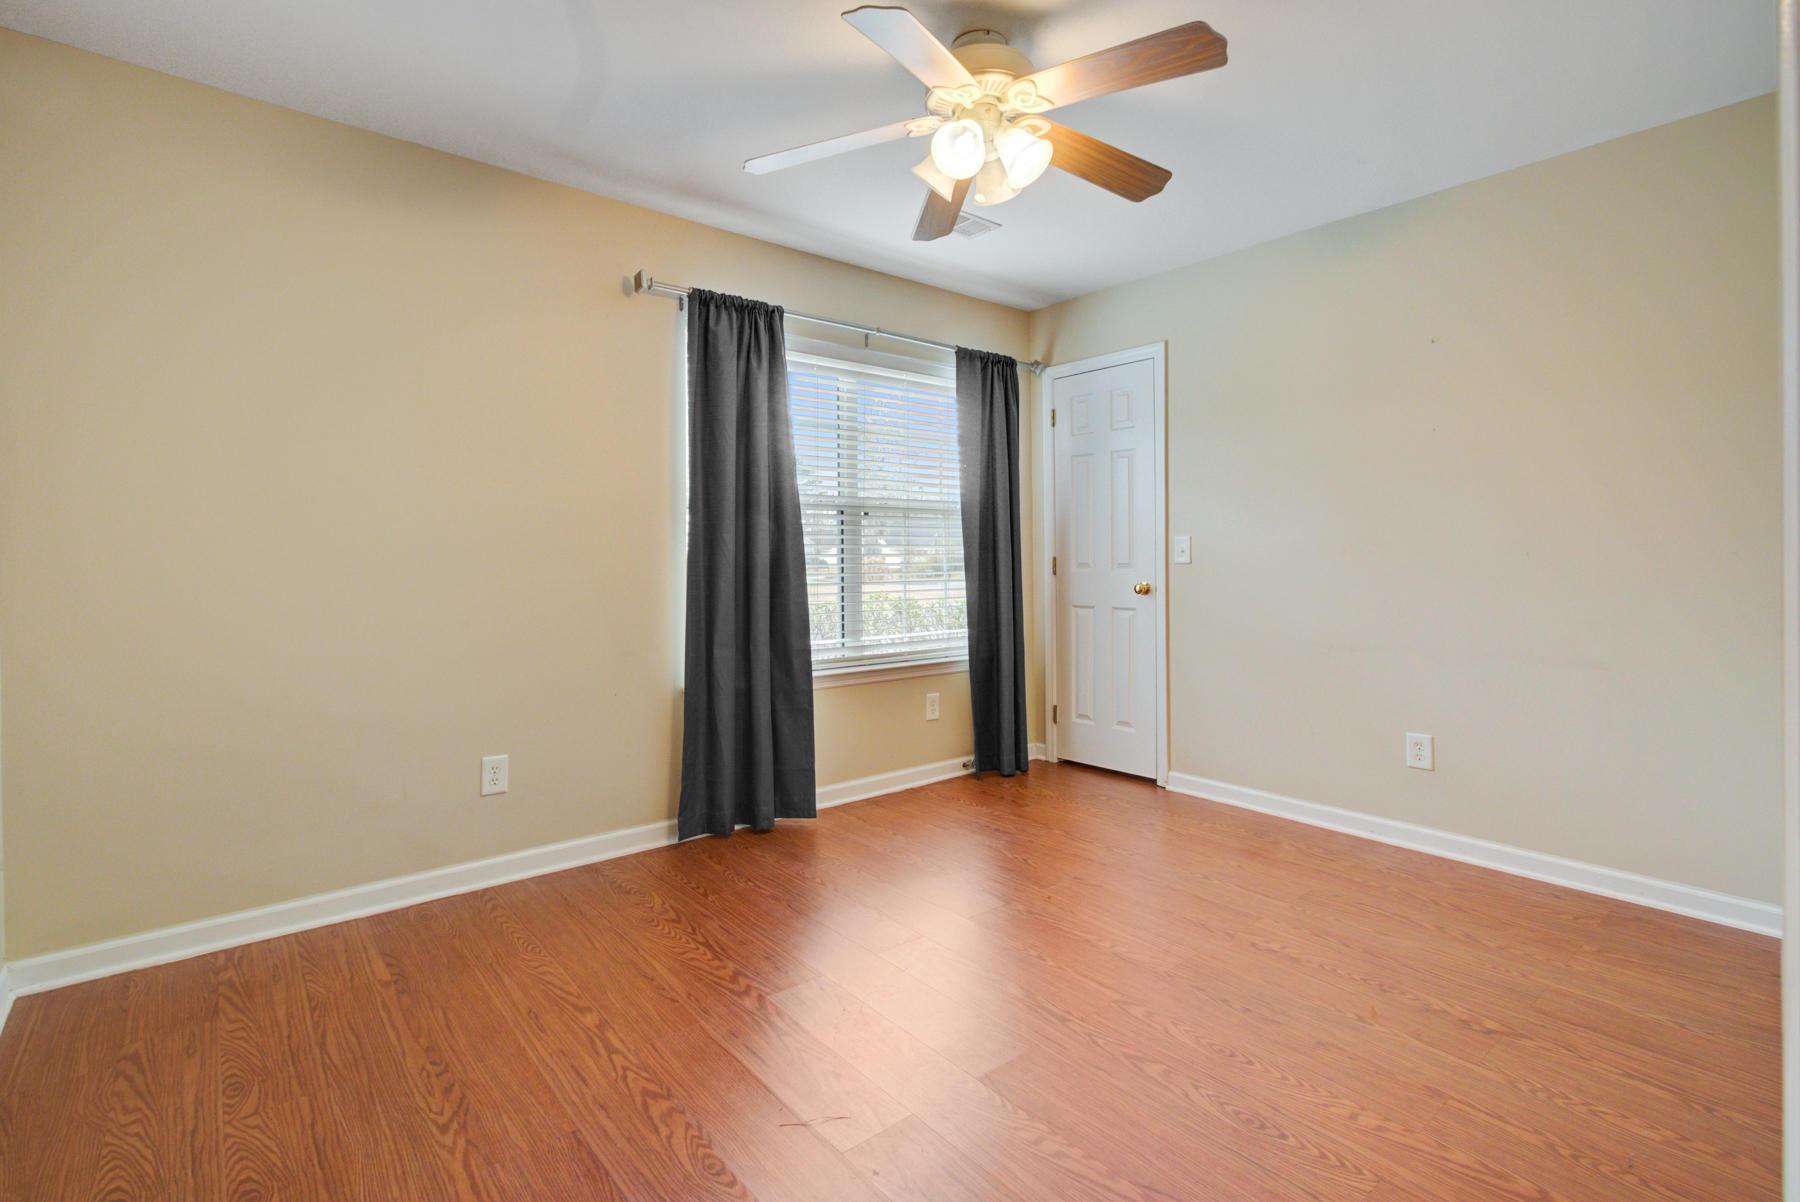 Grand Oaks Plantation Homes For Sale - 564 Hainesworth, Charleston, SC - 5